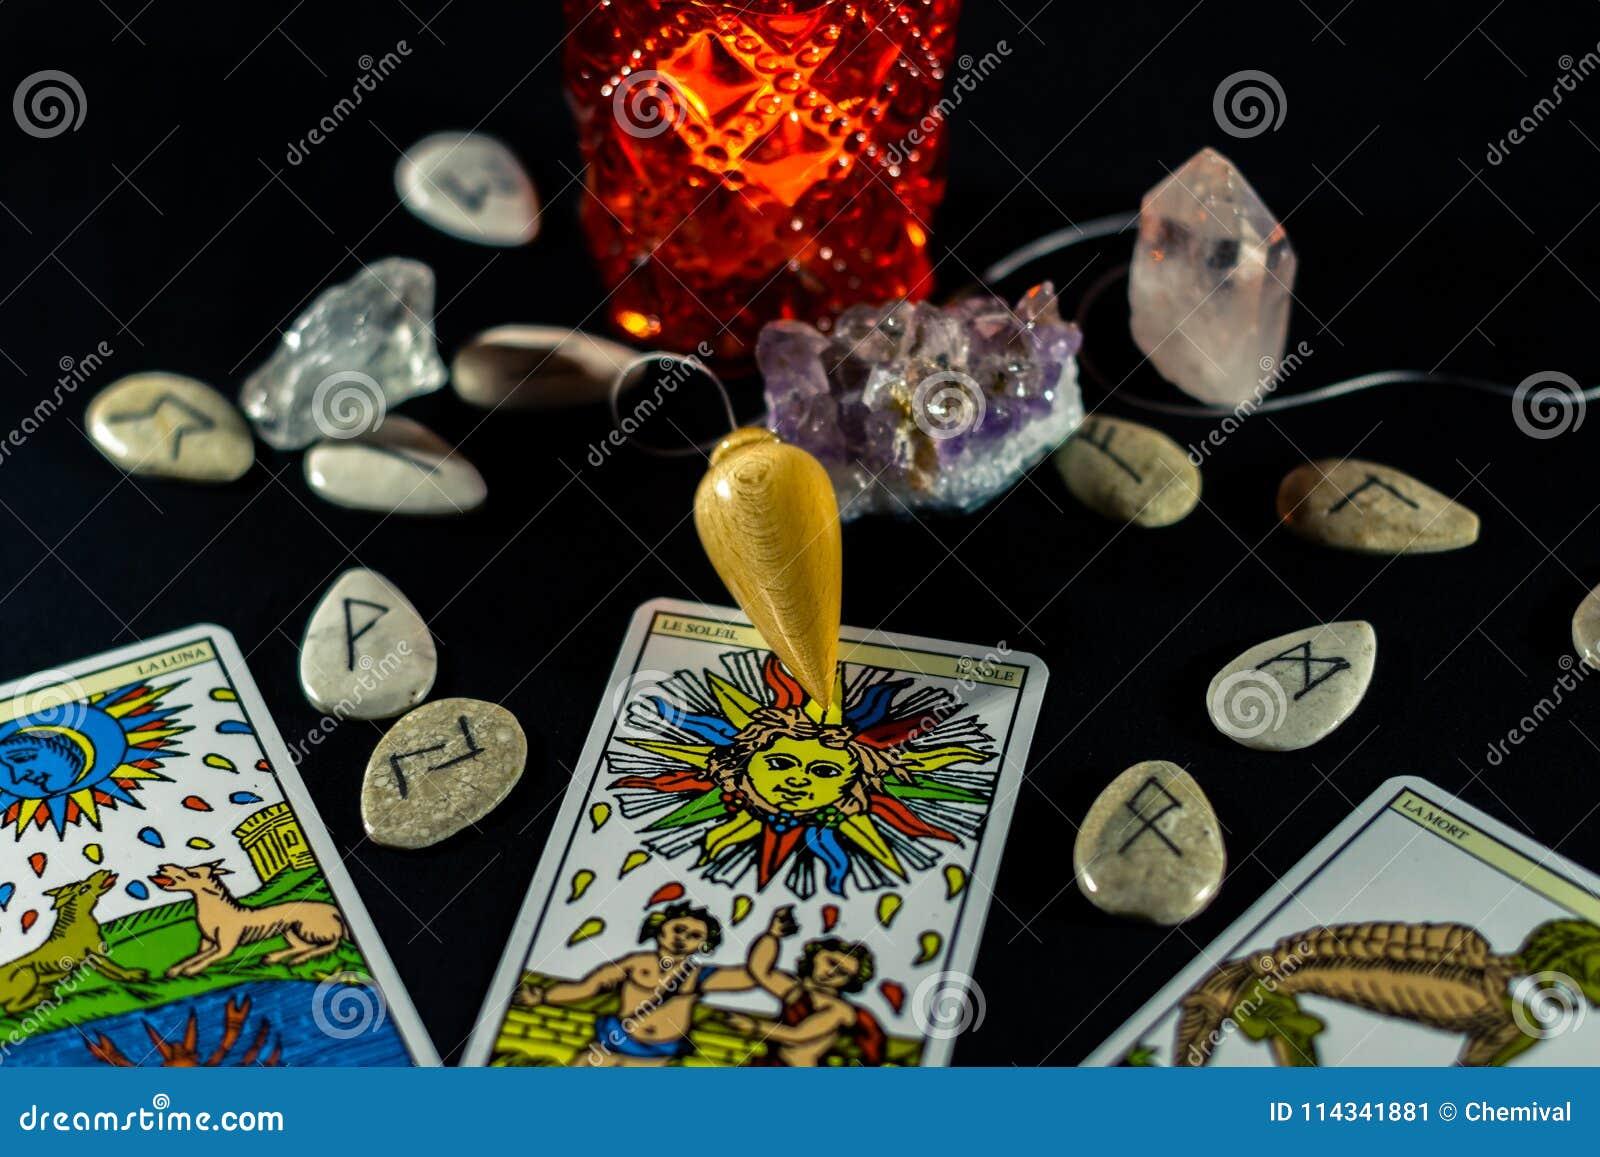 Pendule De Radiesthesie Avec Le Tarot Et Les Runes Image Stock Image Du Pendule Runes 114341881